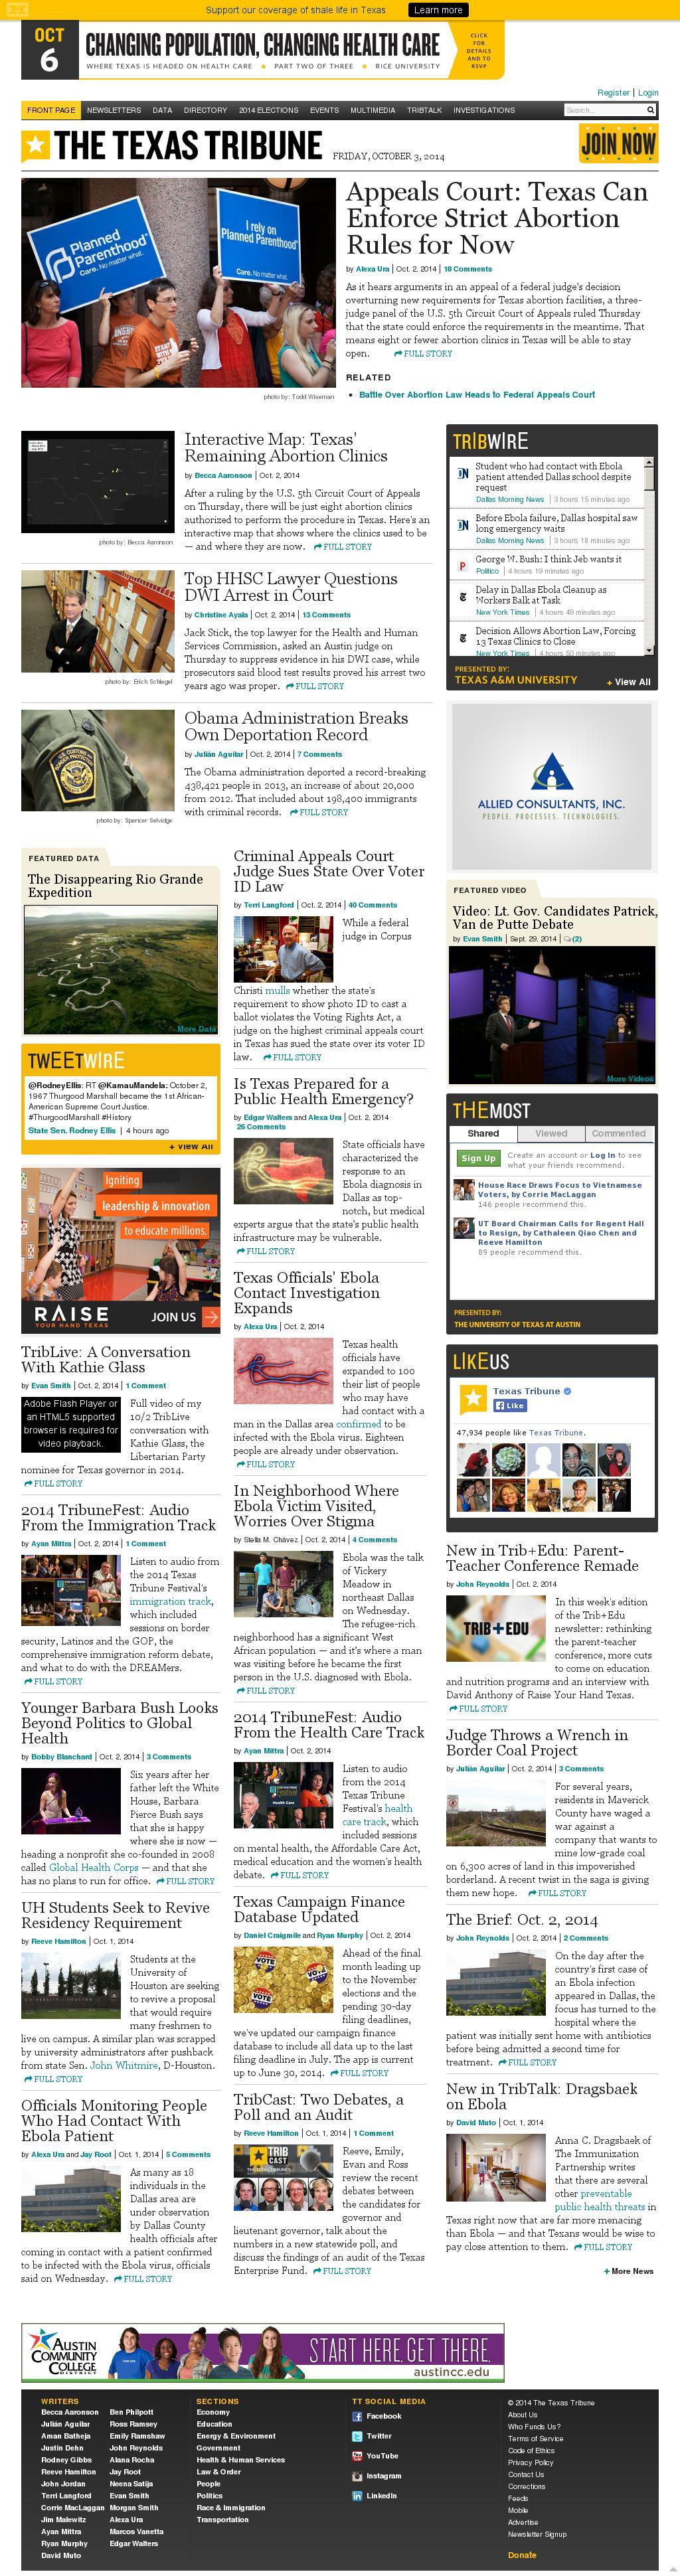 The Texas Tribune at Friday Oct. 3, 2014, 8:15 a.m. UTC